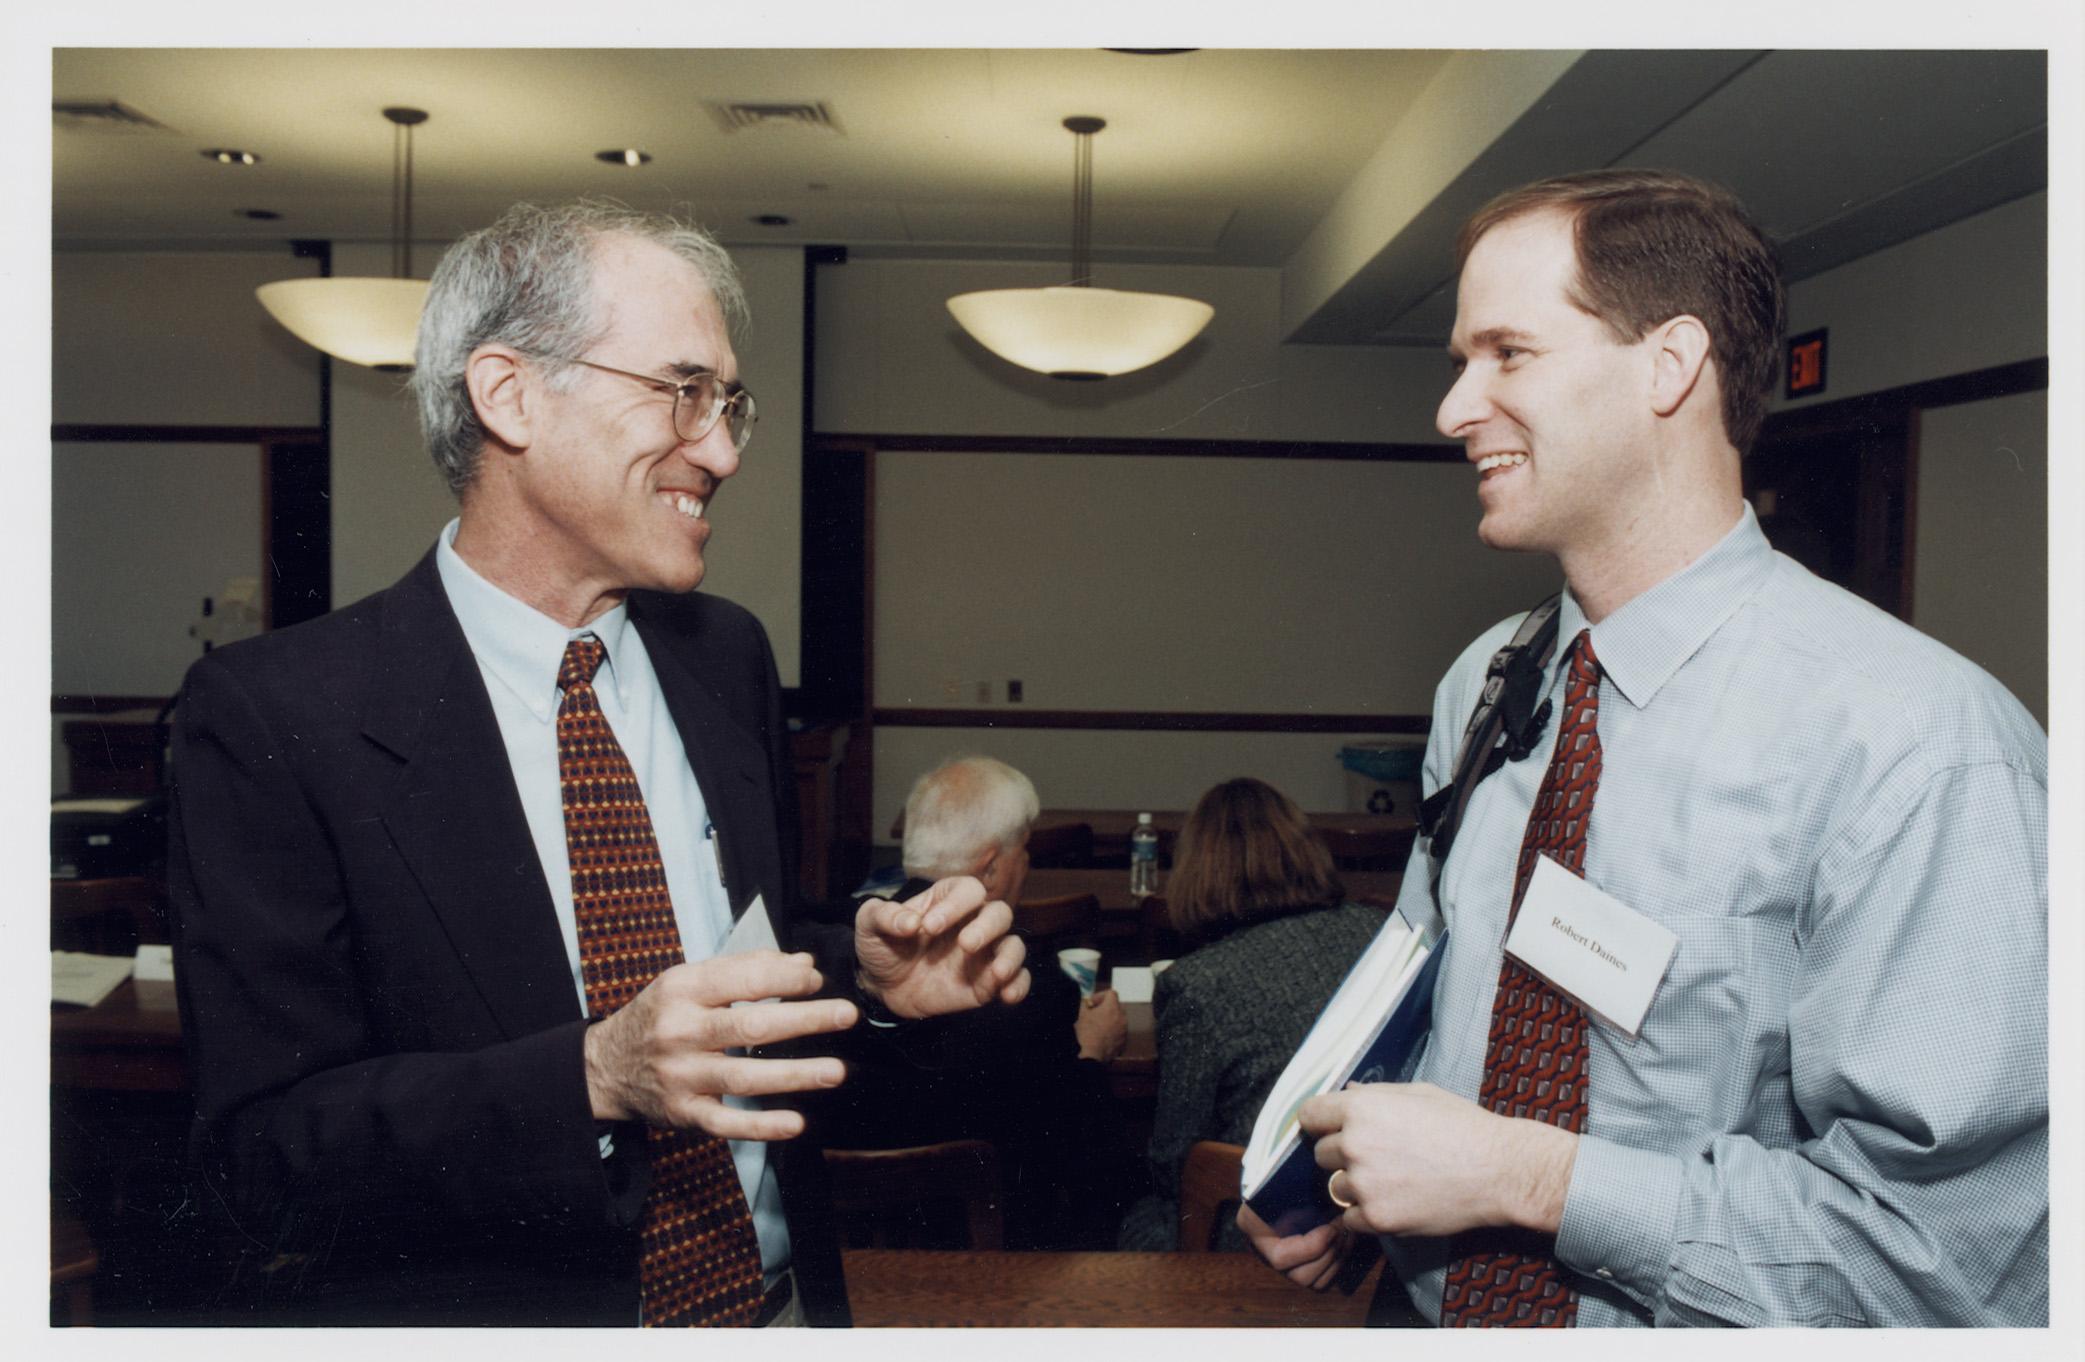 NYU Stern Prof. Yakov Amihud and NYU Law Prof. and Visiting YLS Prof. Robert Daines '92